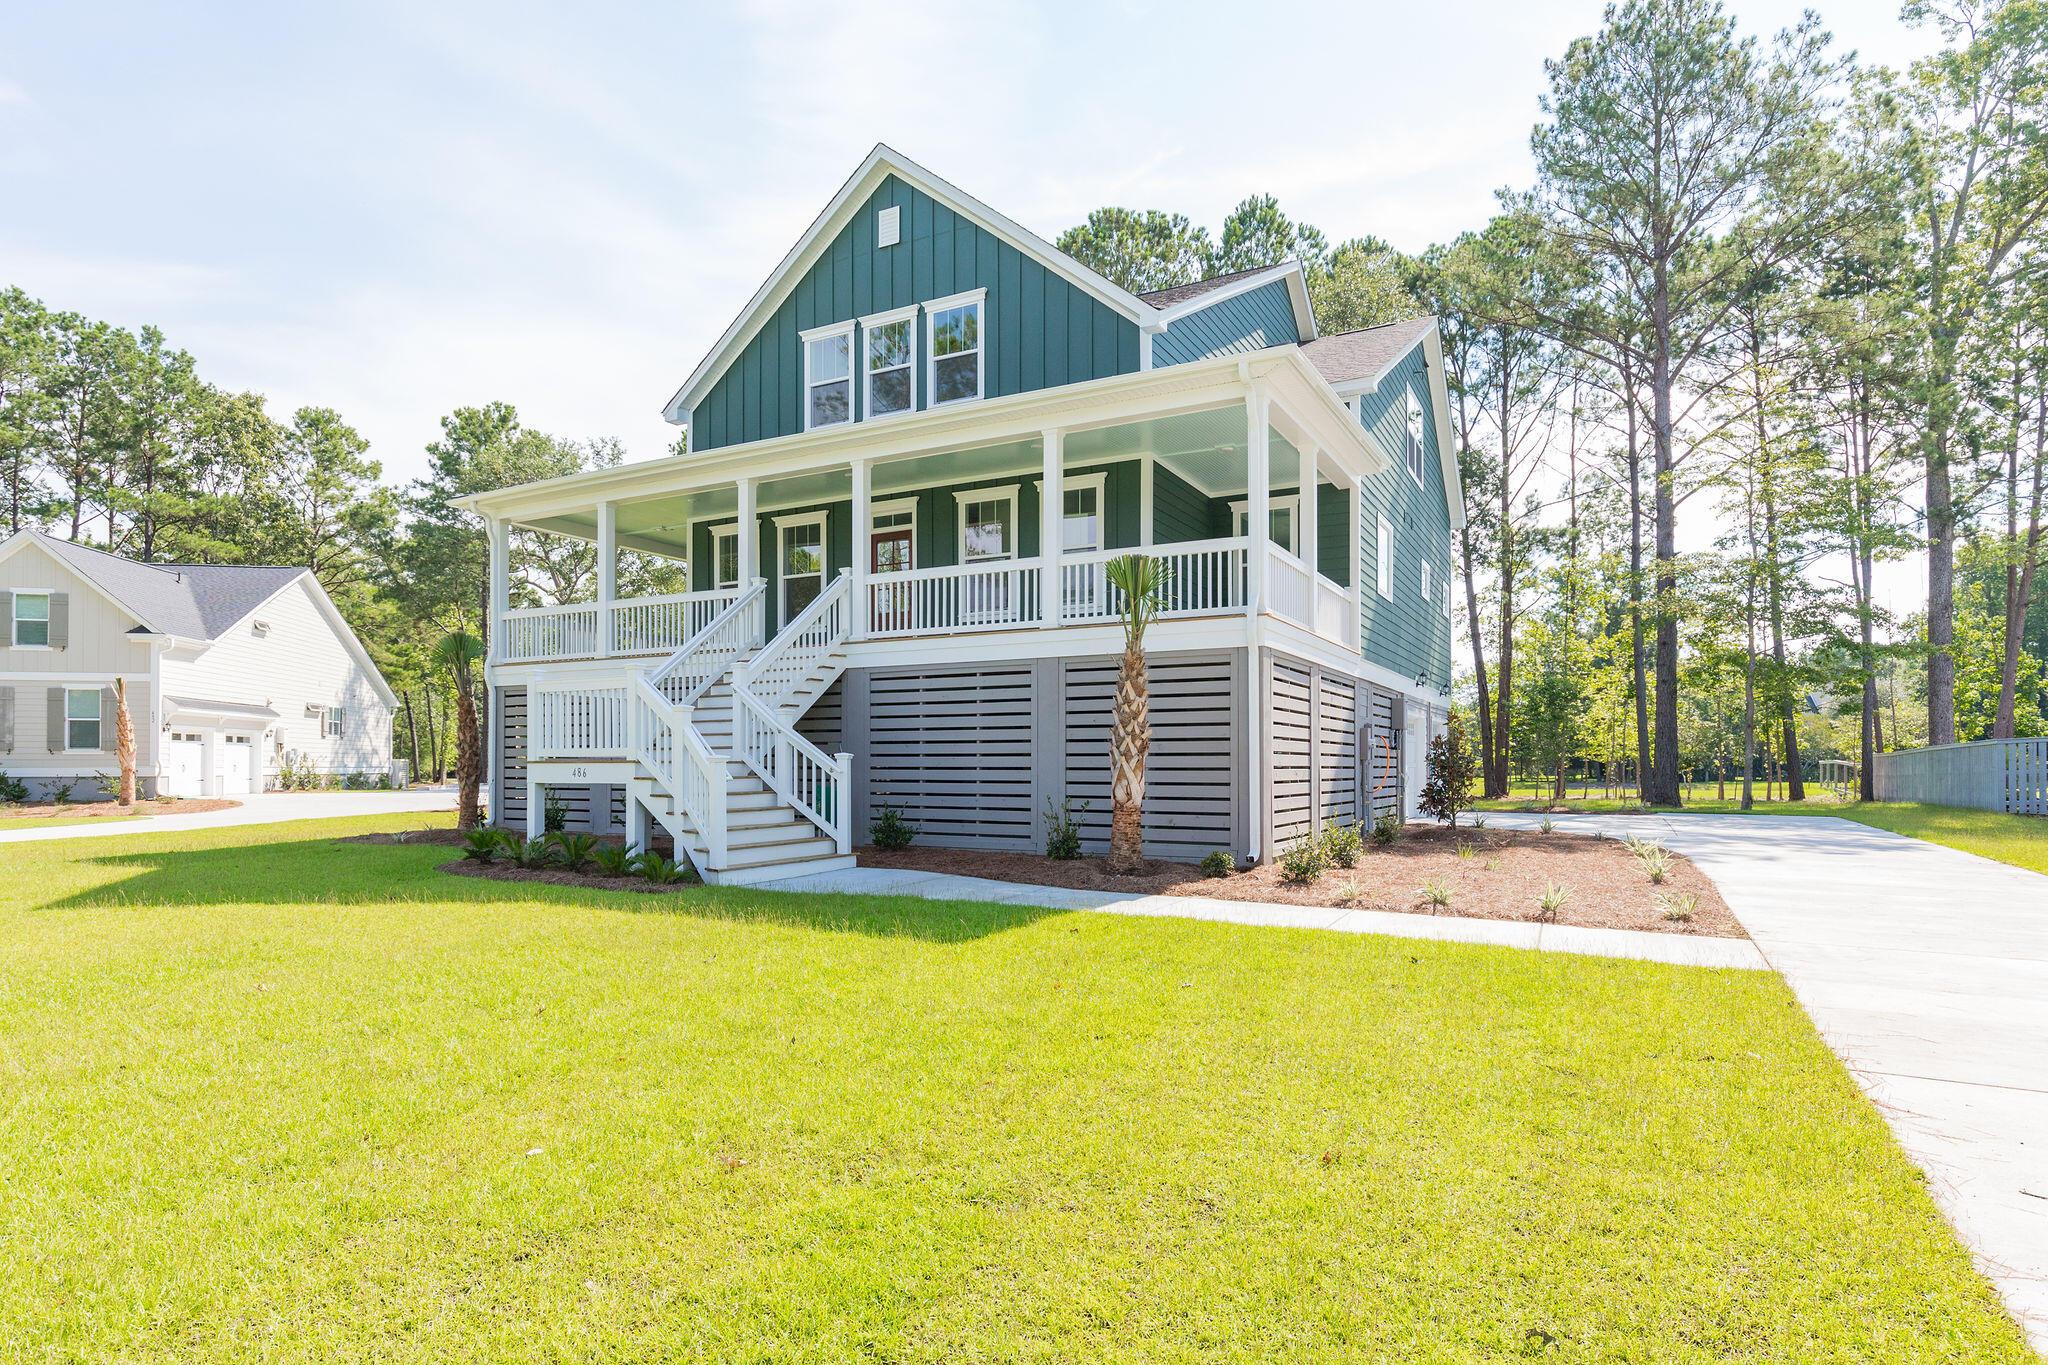 Rushland Plantation Homes For Sale - 2421 Rushland Landing, Johns Island, SC - 33